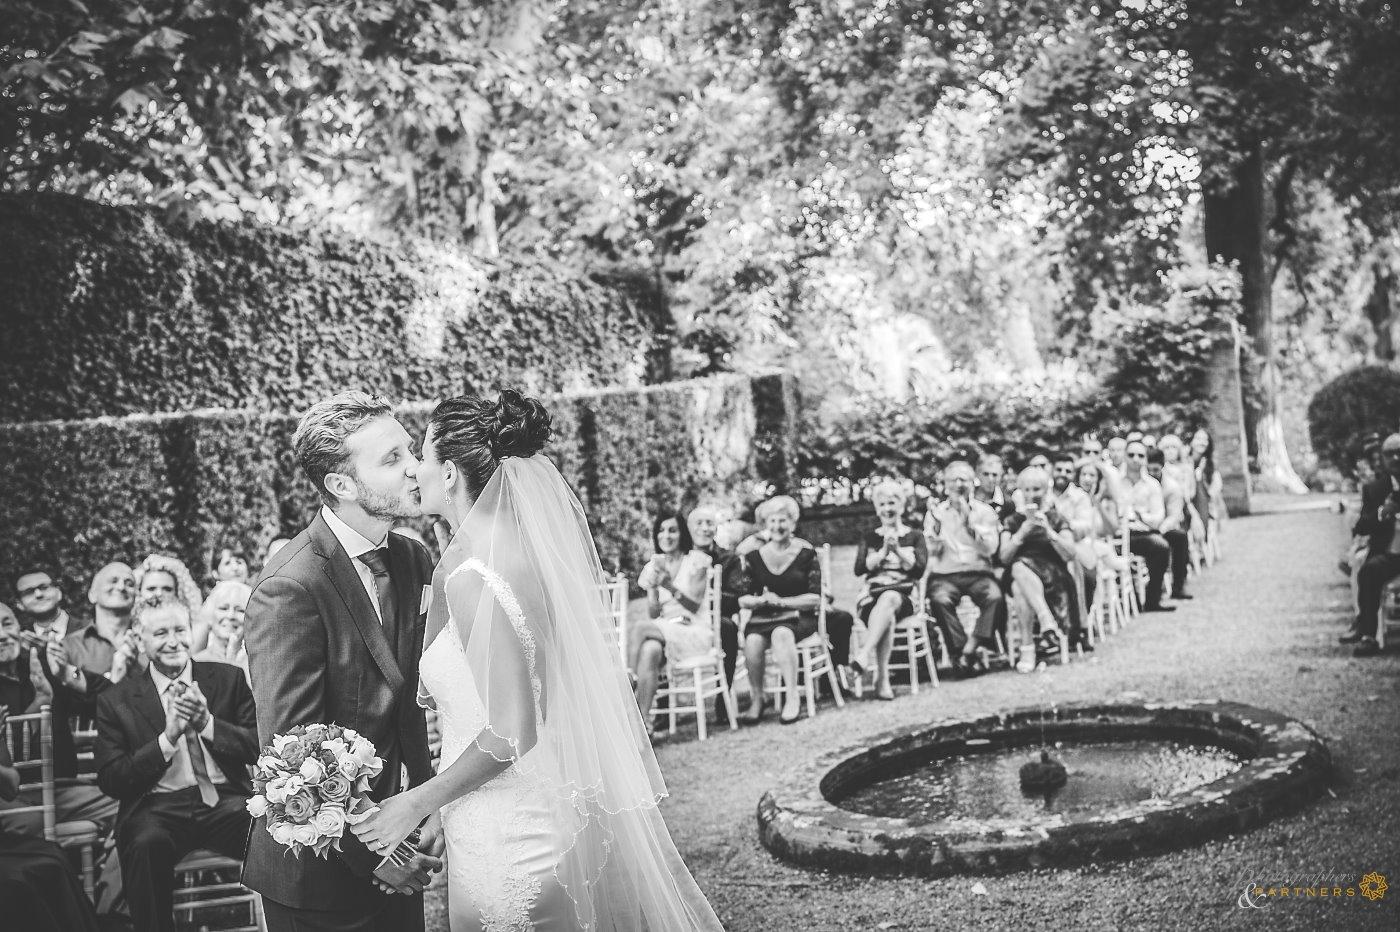 photography_weddings_villa_grabau_07.jpg